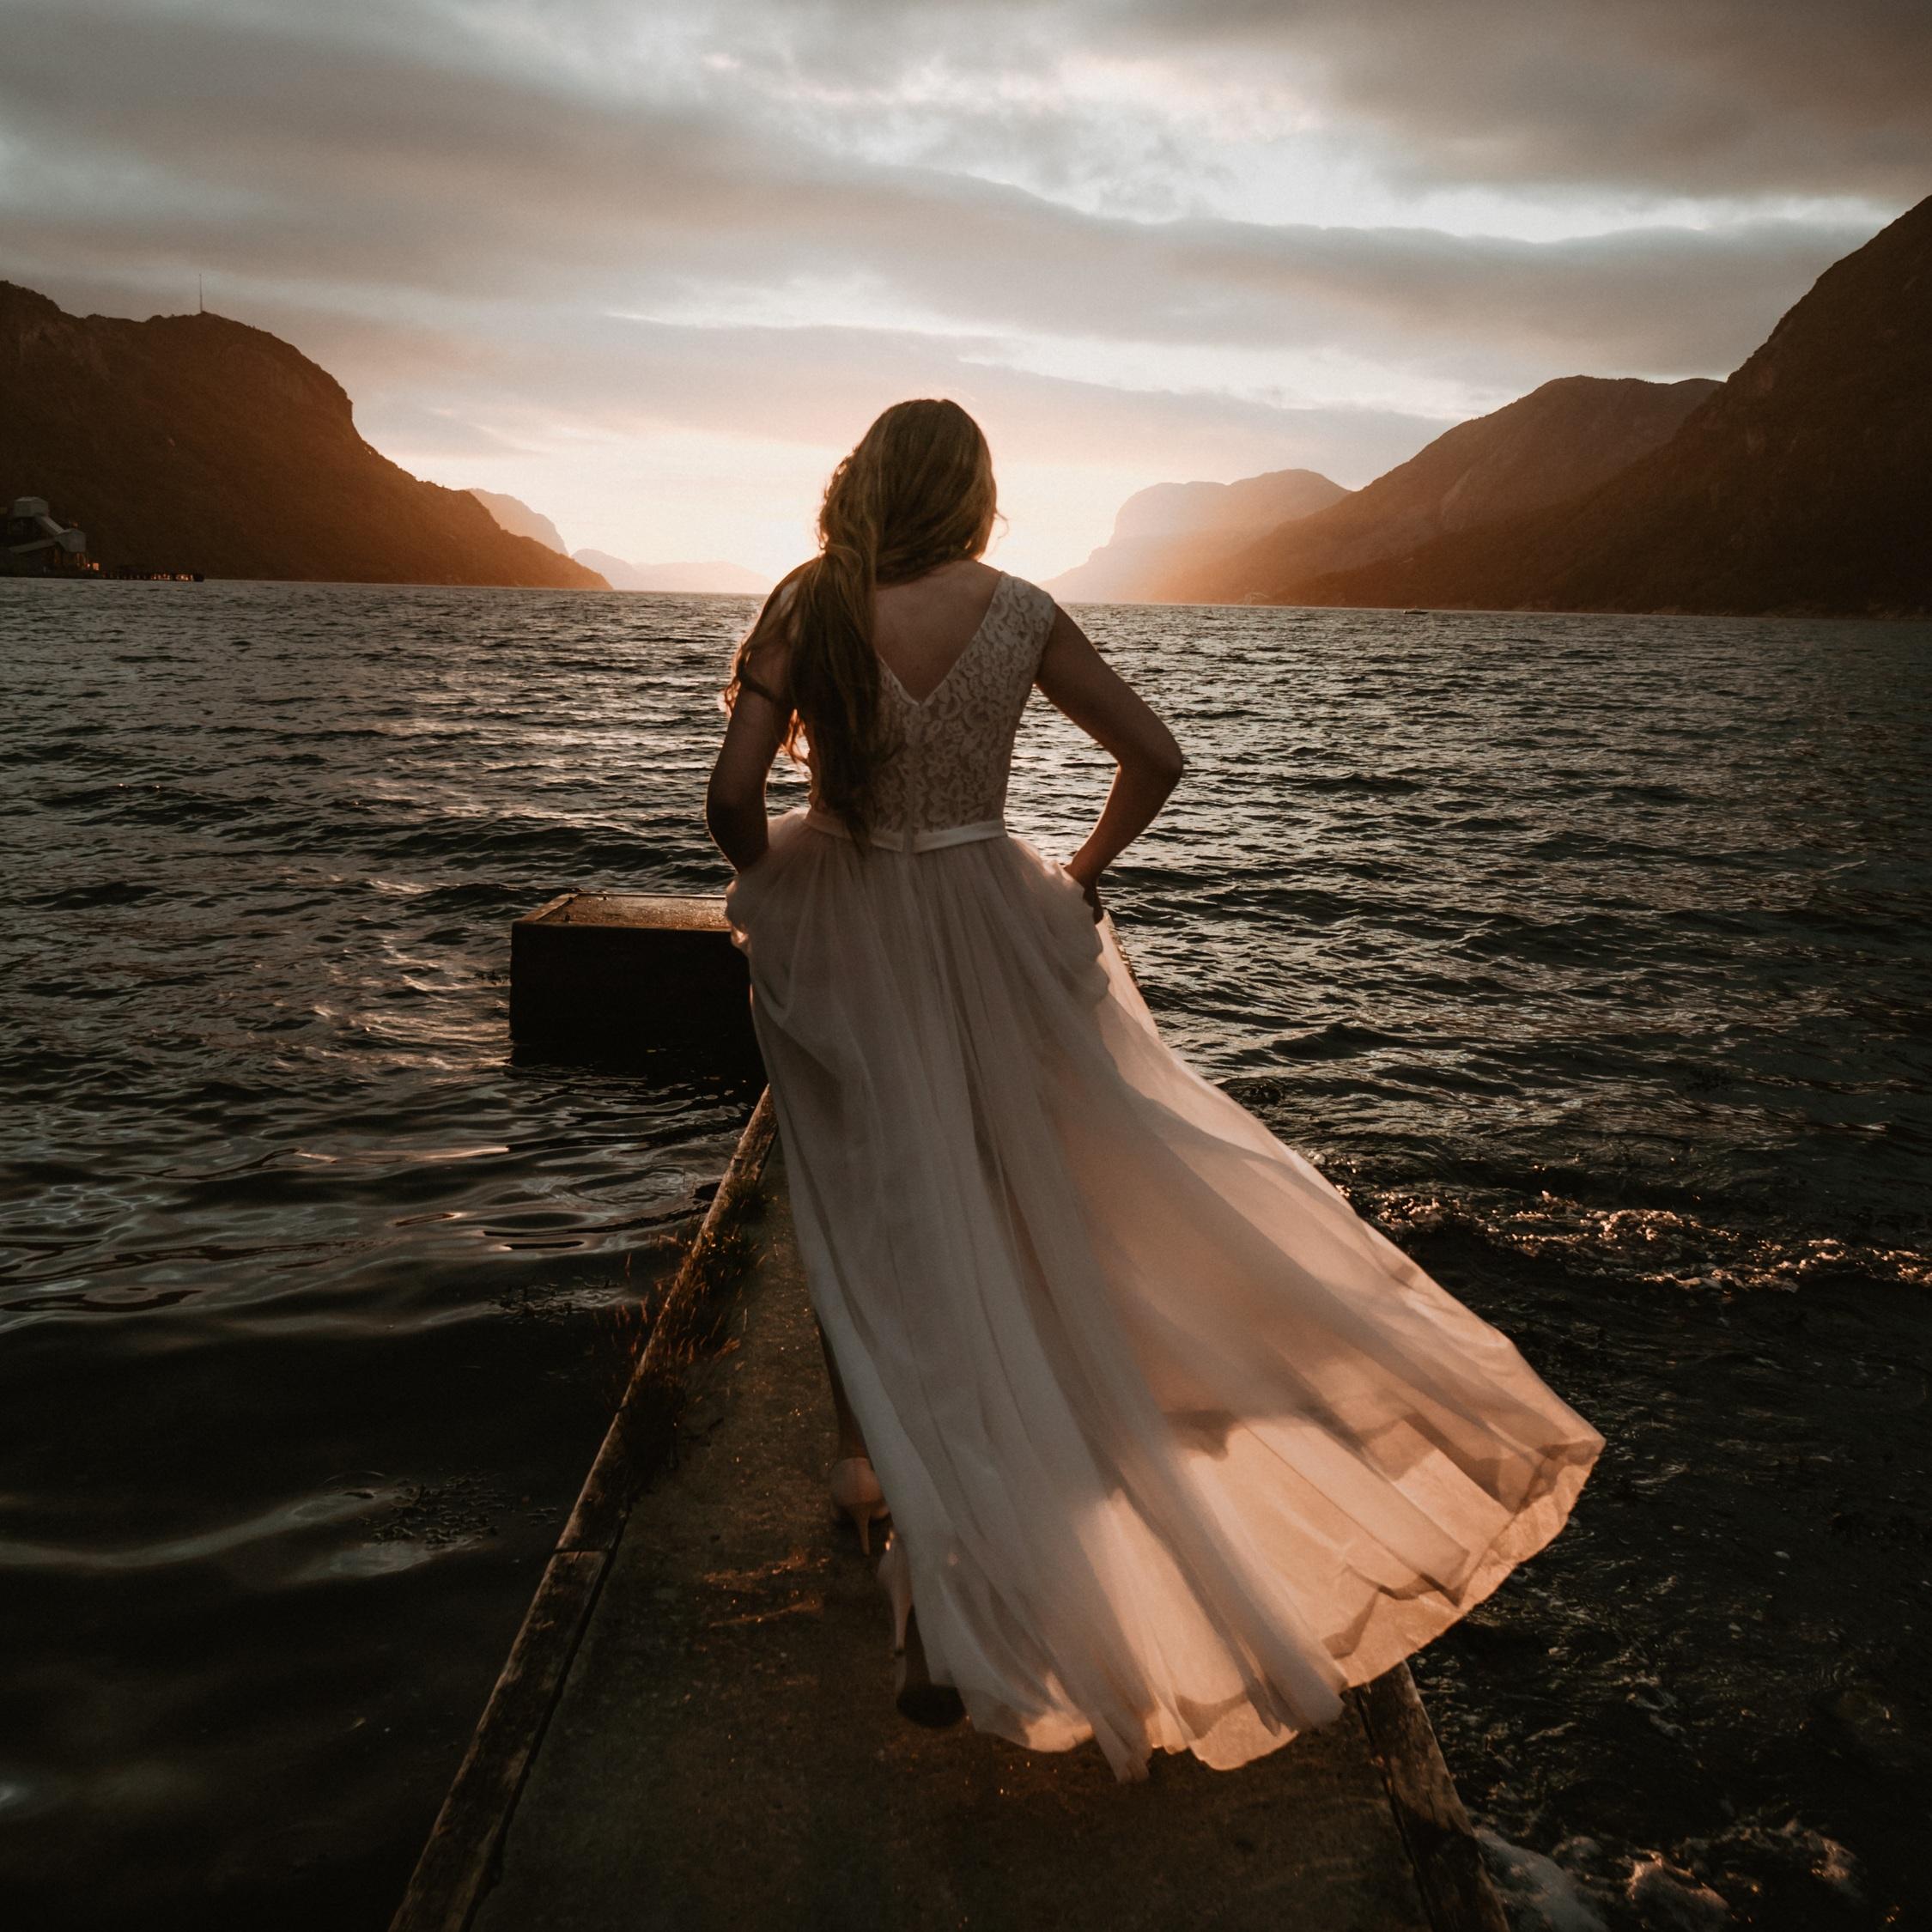 Dridal-Norway-Elopement-Destination-Wedding-Photographer-Skarbek